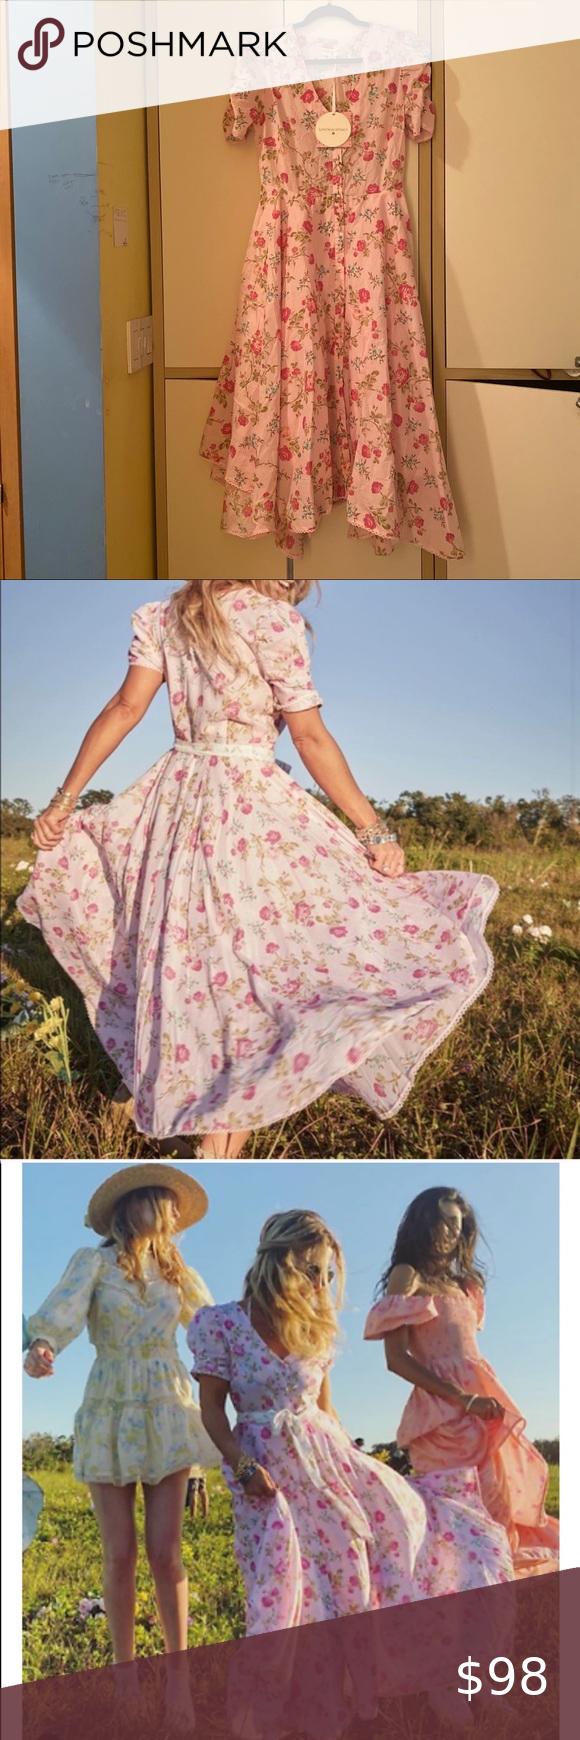 Loveshackfancy Target Audrey Handkerchief Hem Dres Favorite Dress Pink Fashion Loveshackfancy [ 1740 x 580 Pixel ]